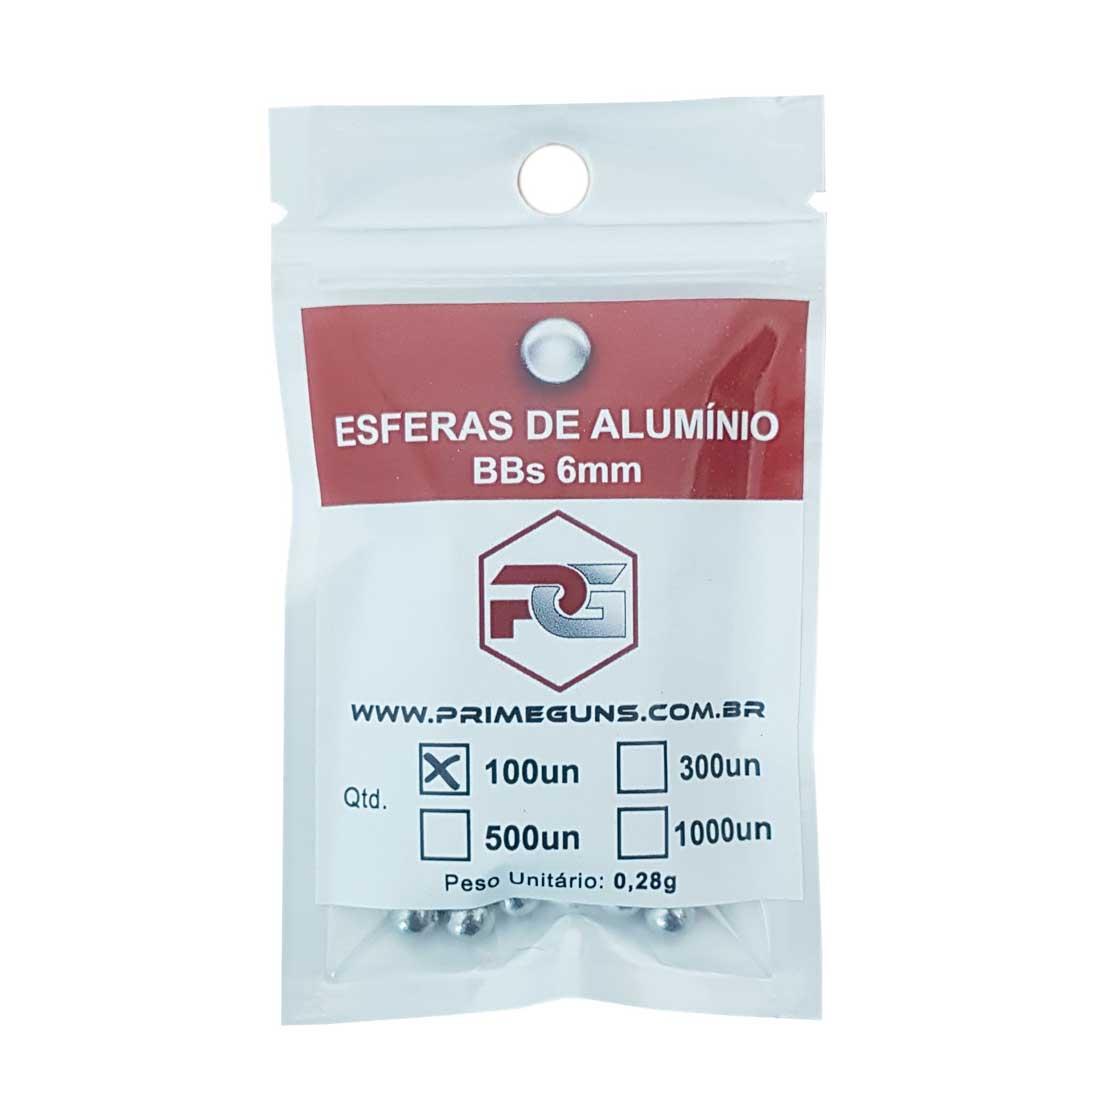 Esfera de Alumínio 6mm .28g Para Airsoft e Airgun 100un